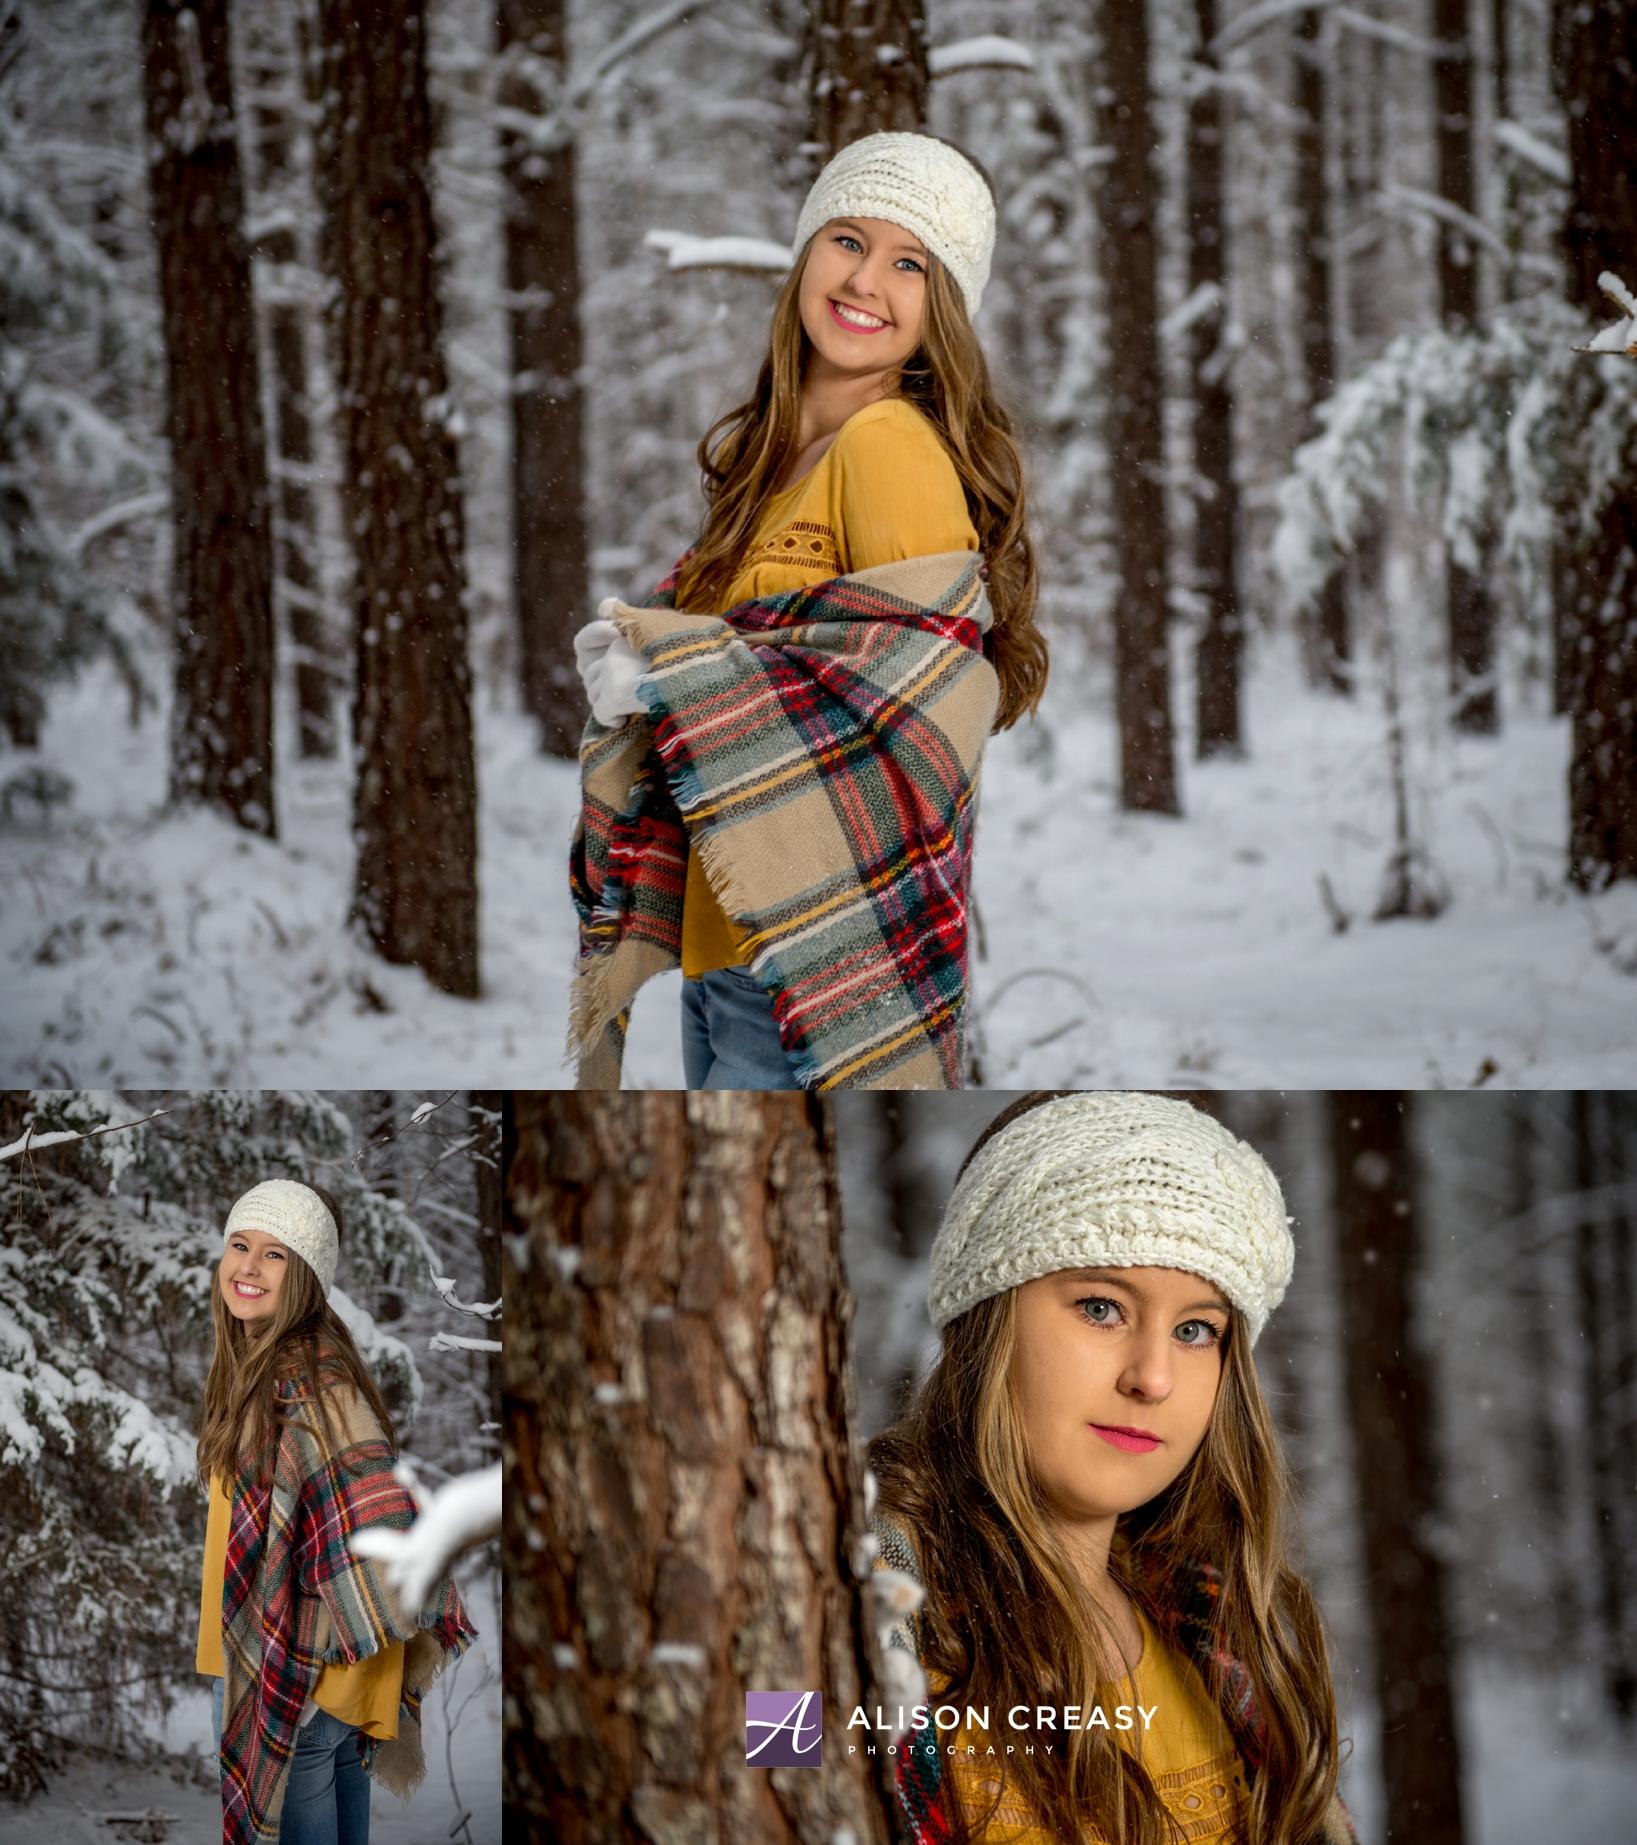 Alison-Creasy-Photography-Lynchburg-VA-Senior-Photographer_0024.jpg